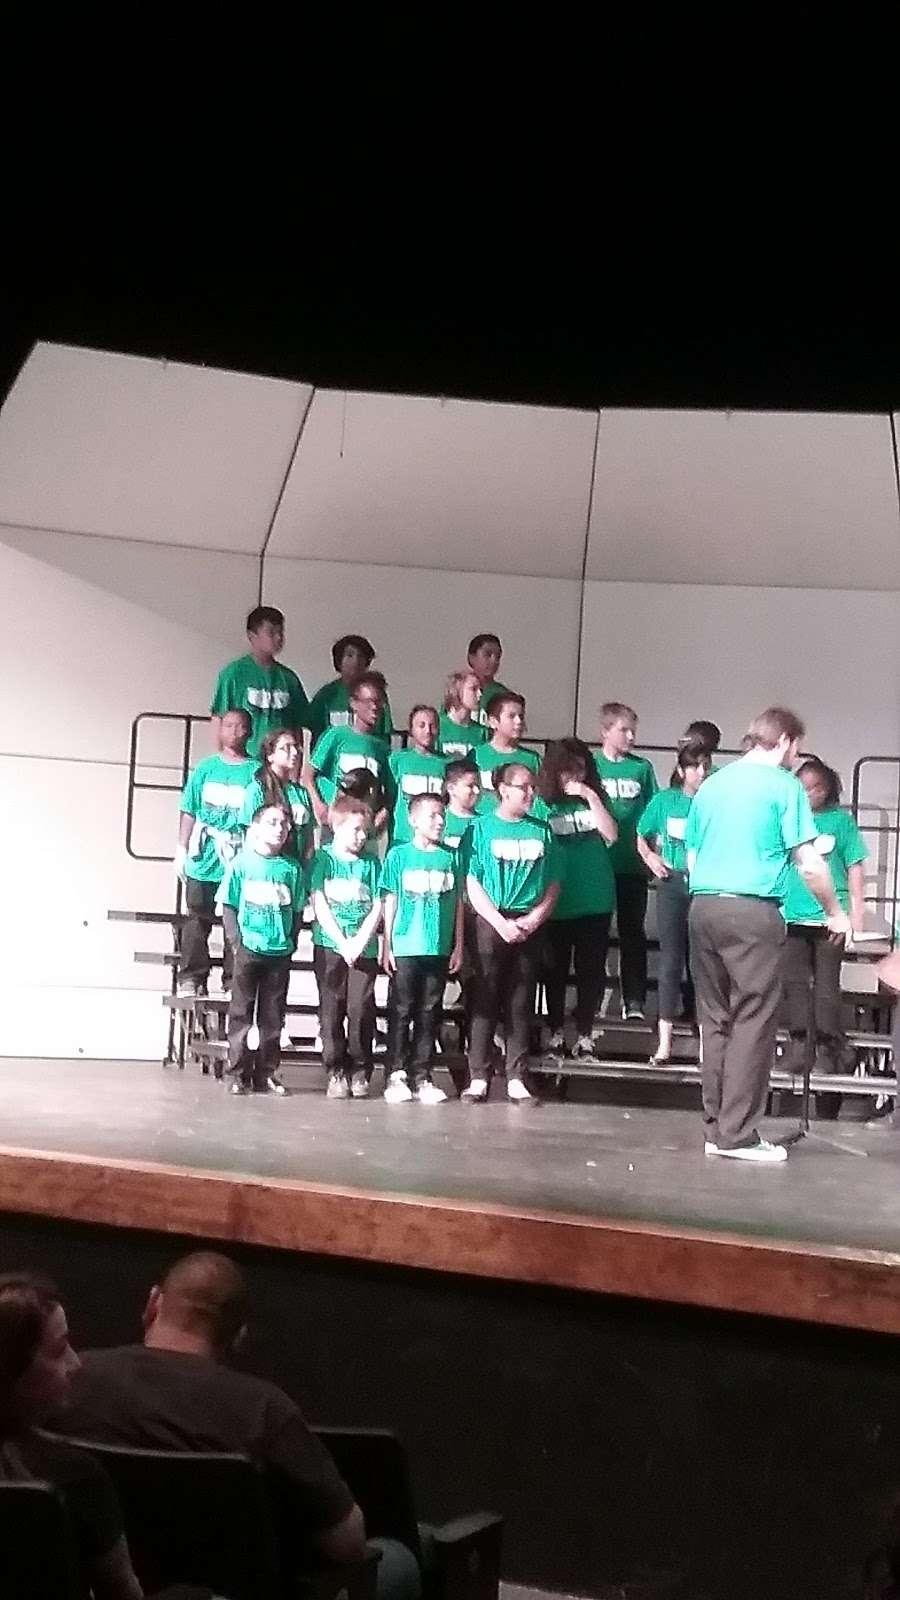 Prairie Middle School - school  | Photo 4 of 6 | Address: 12600 E Jewell Ave, Aurora, CO 80012, USA | Phone: (720) 747-3000